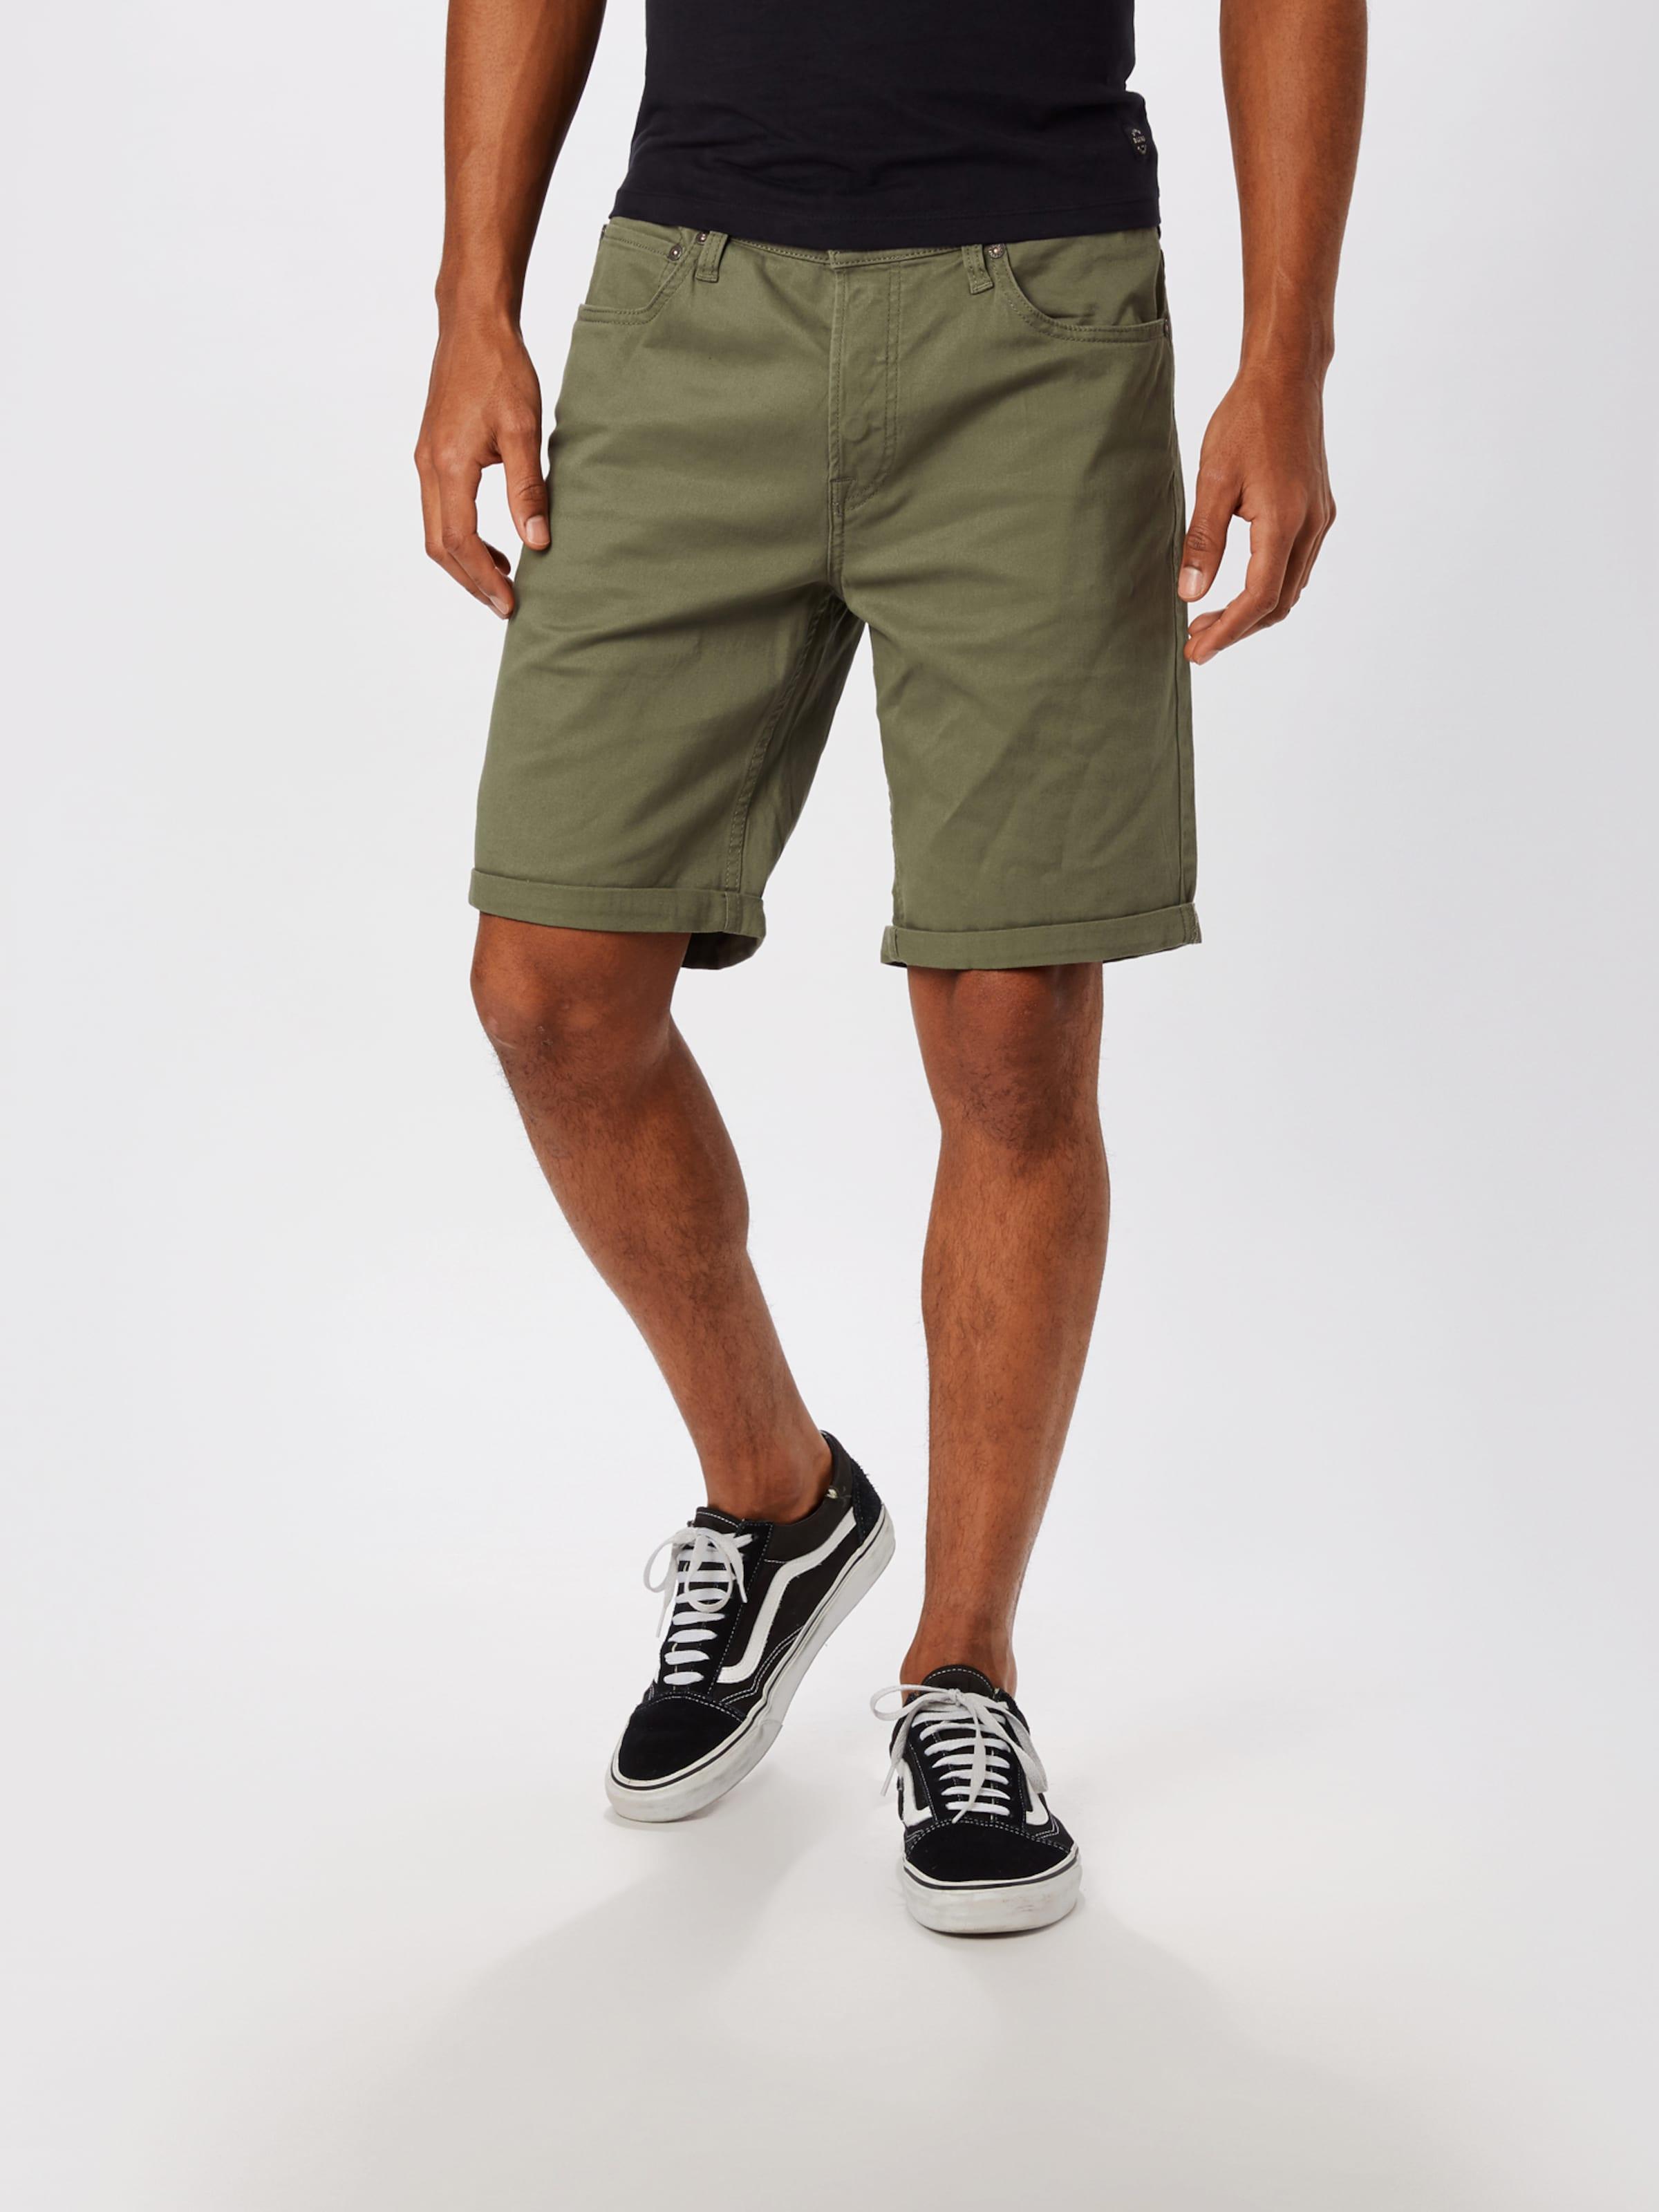 JACK & JONES Shorts 'Rick' in oliv Unifarben 5714500985020